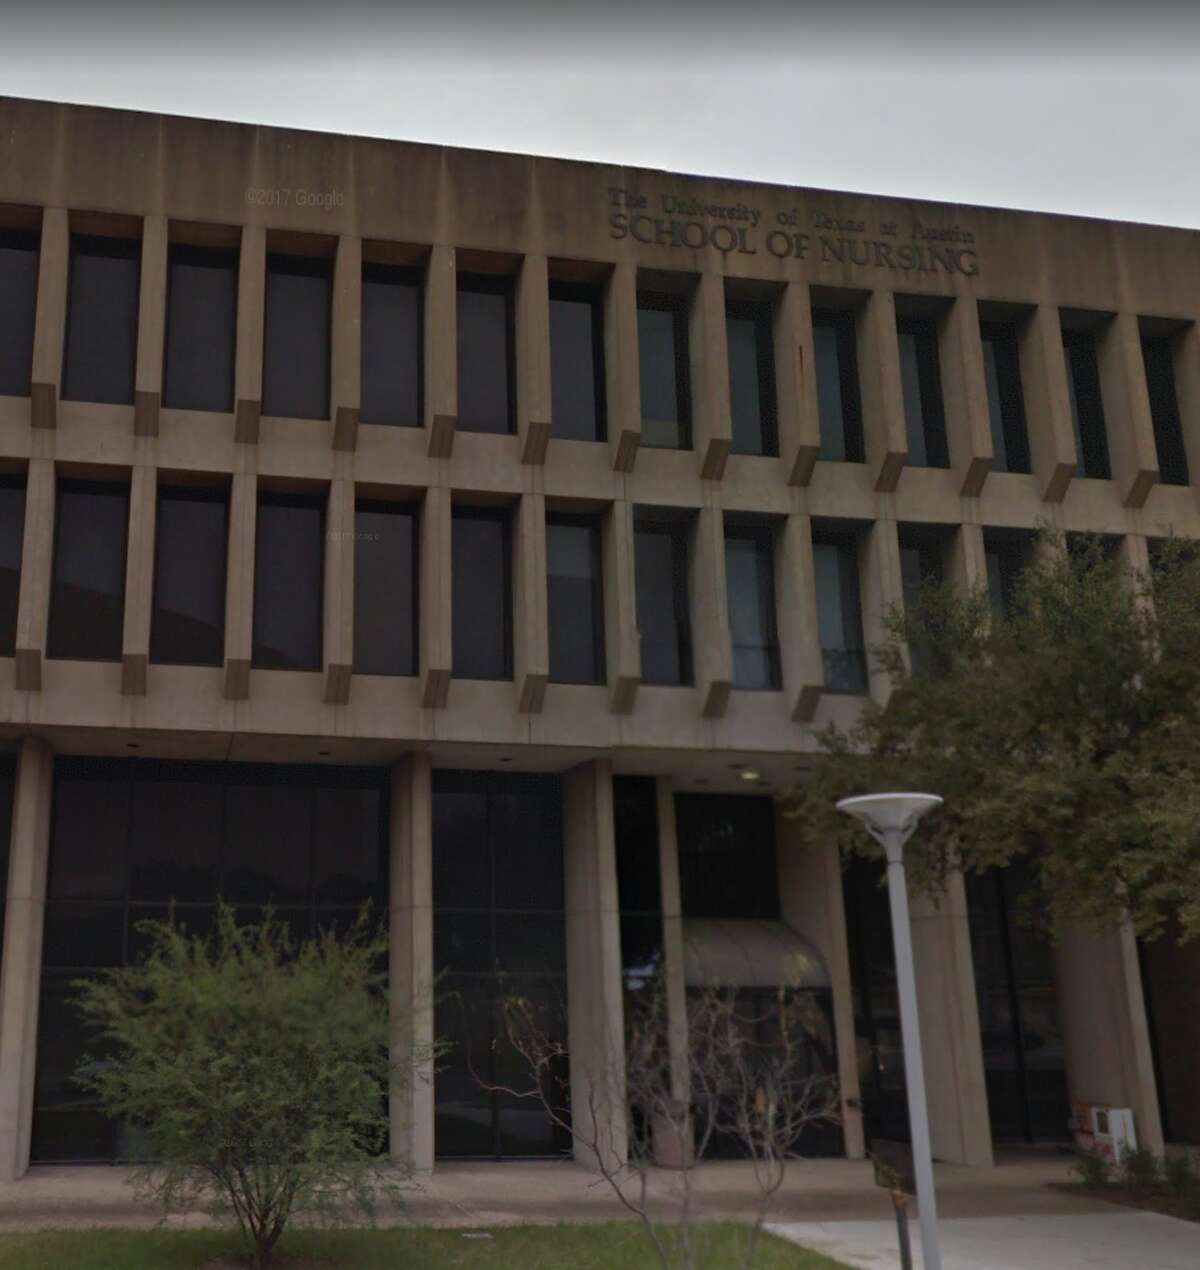 University of Texas - Austin Location: Austin, TX Programs: Bachelor's of Science in Nursing,Master's of Science in Nursing Degree Score: 94.08 Rank in Texas: 19